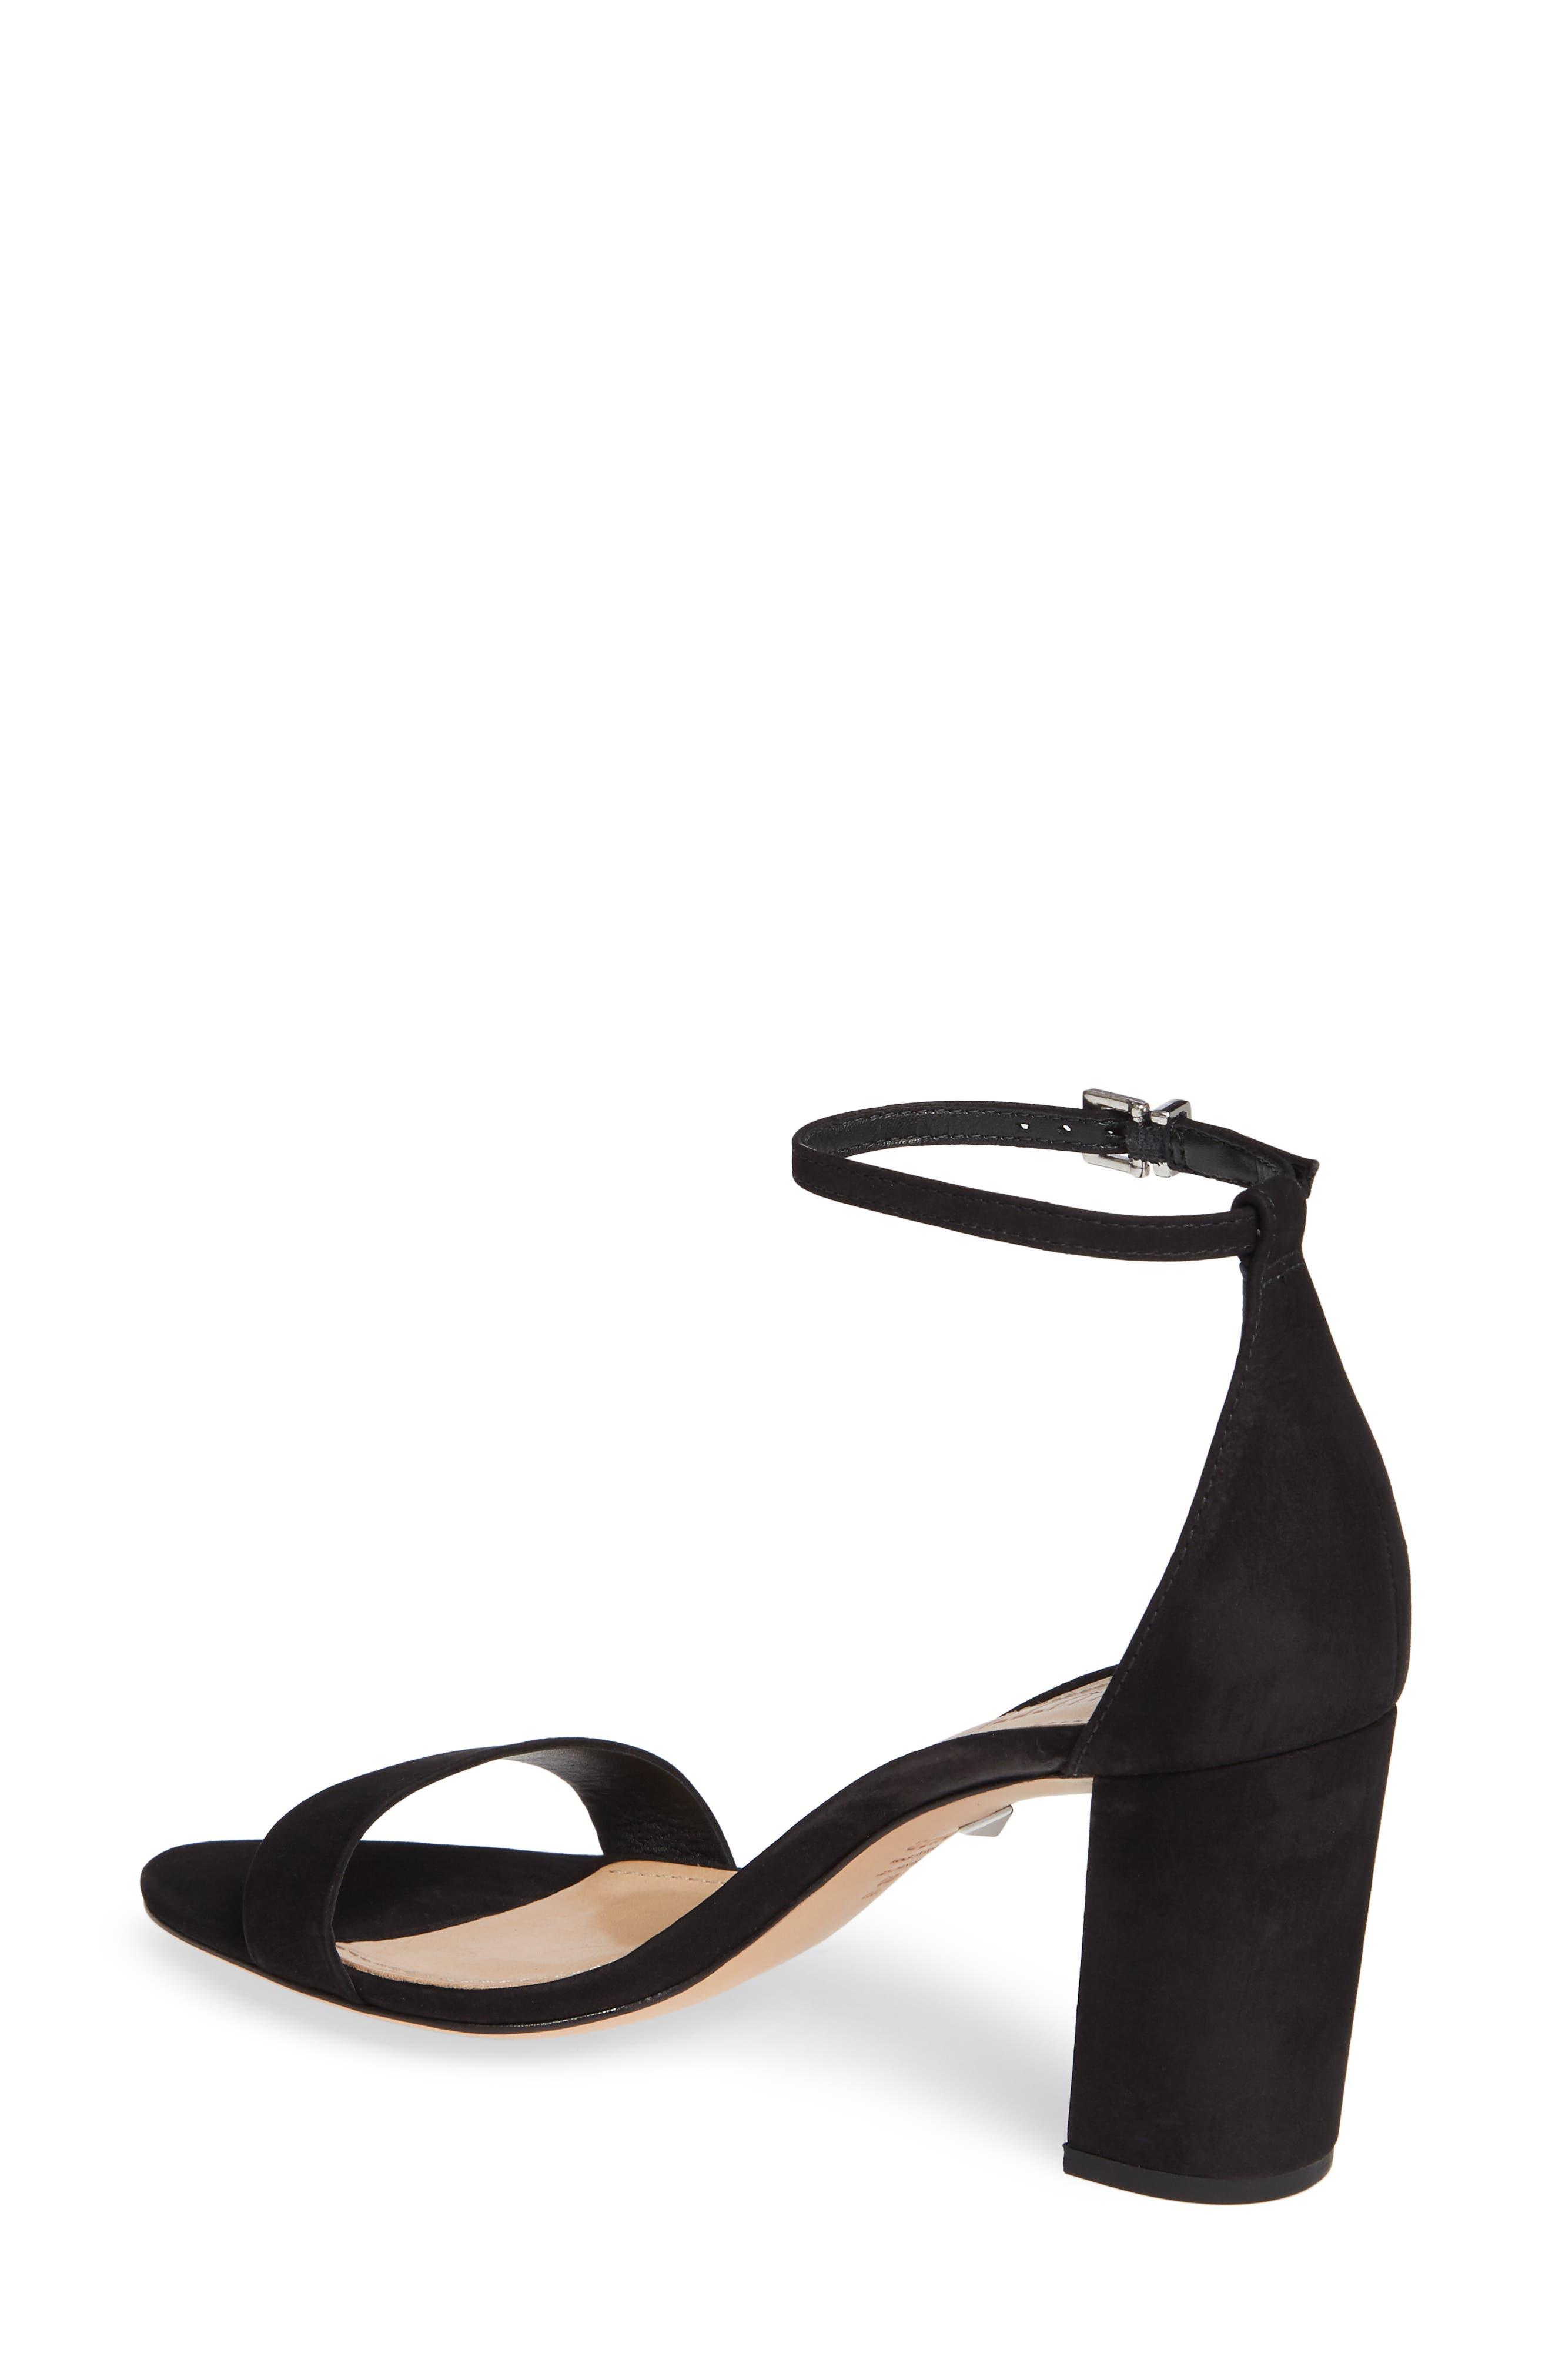 Anna Lee Ankle Strap Sandal,                             Alternate thumbnail 2, color,                             BLACK NUBUCK LEATHER